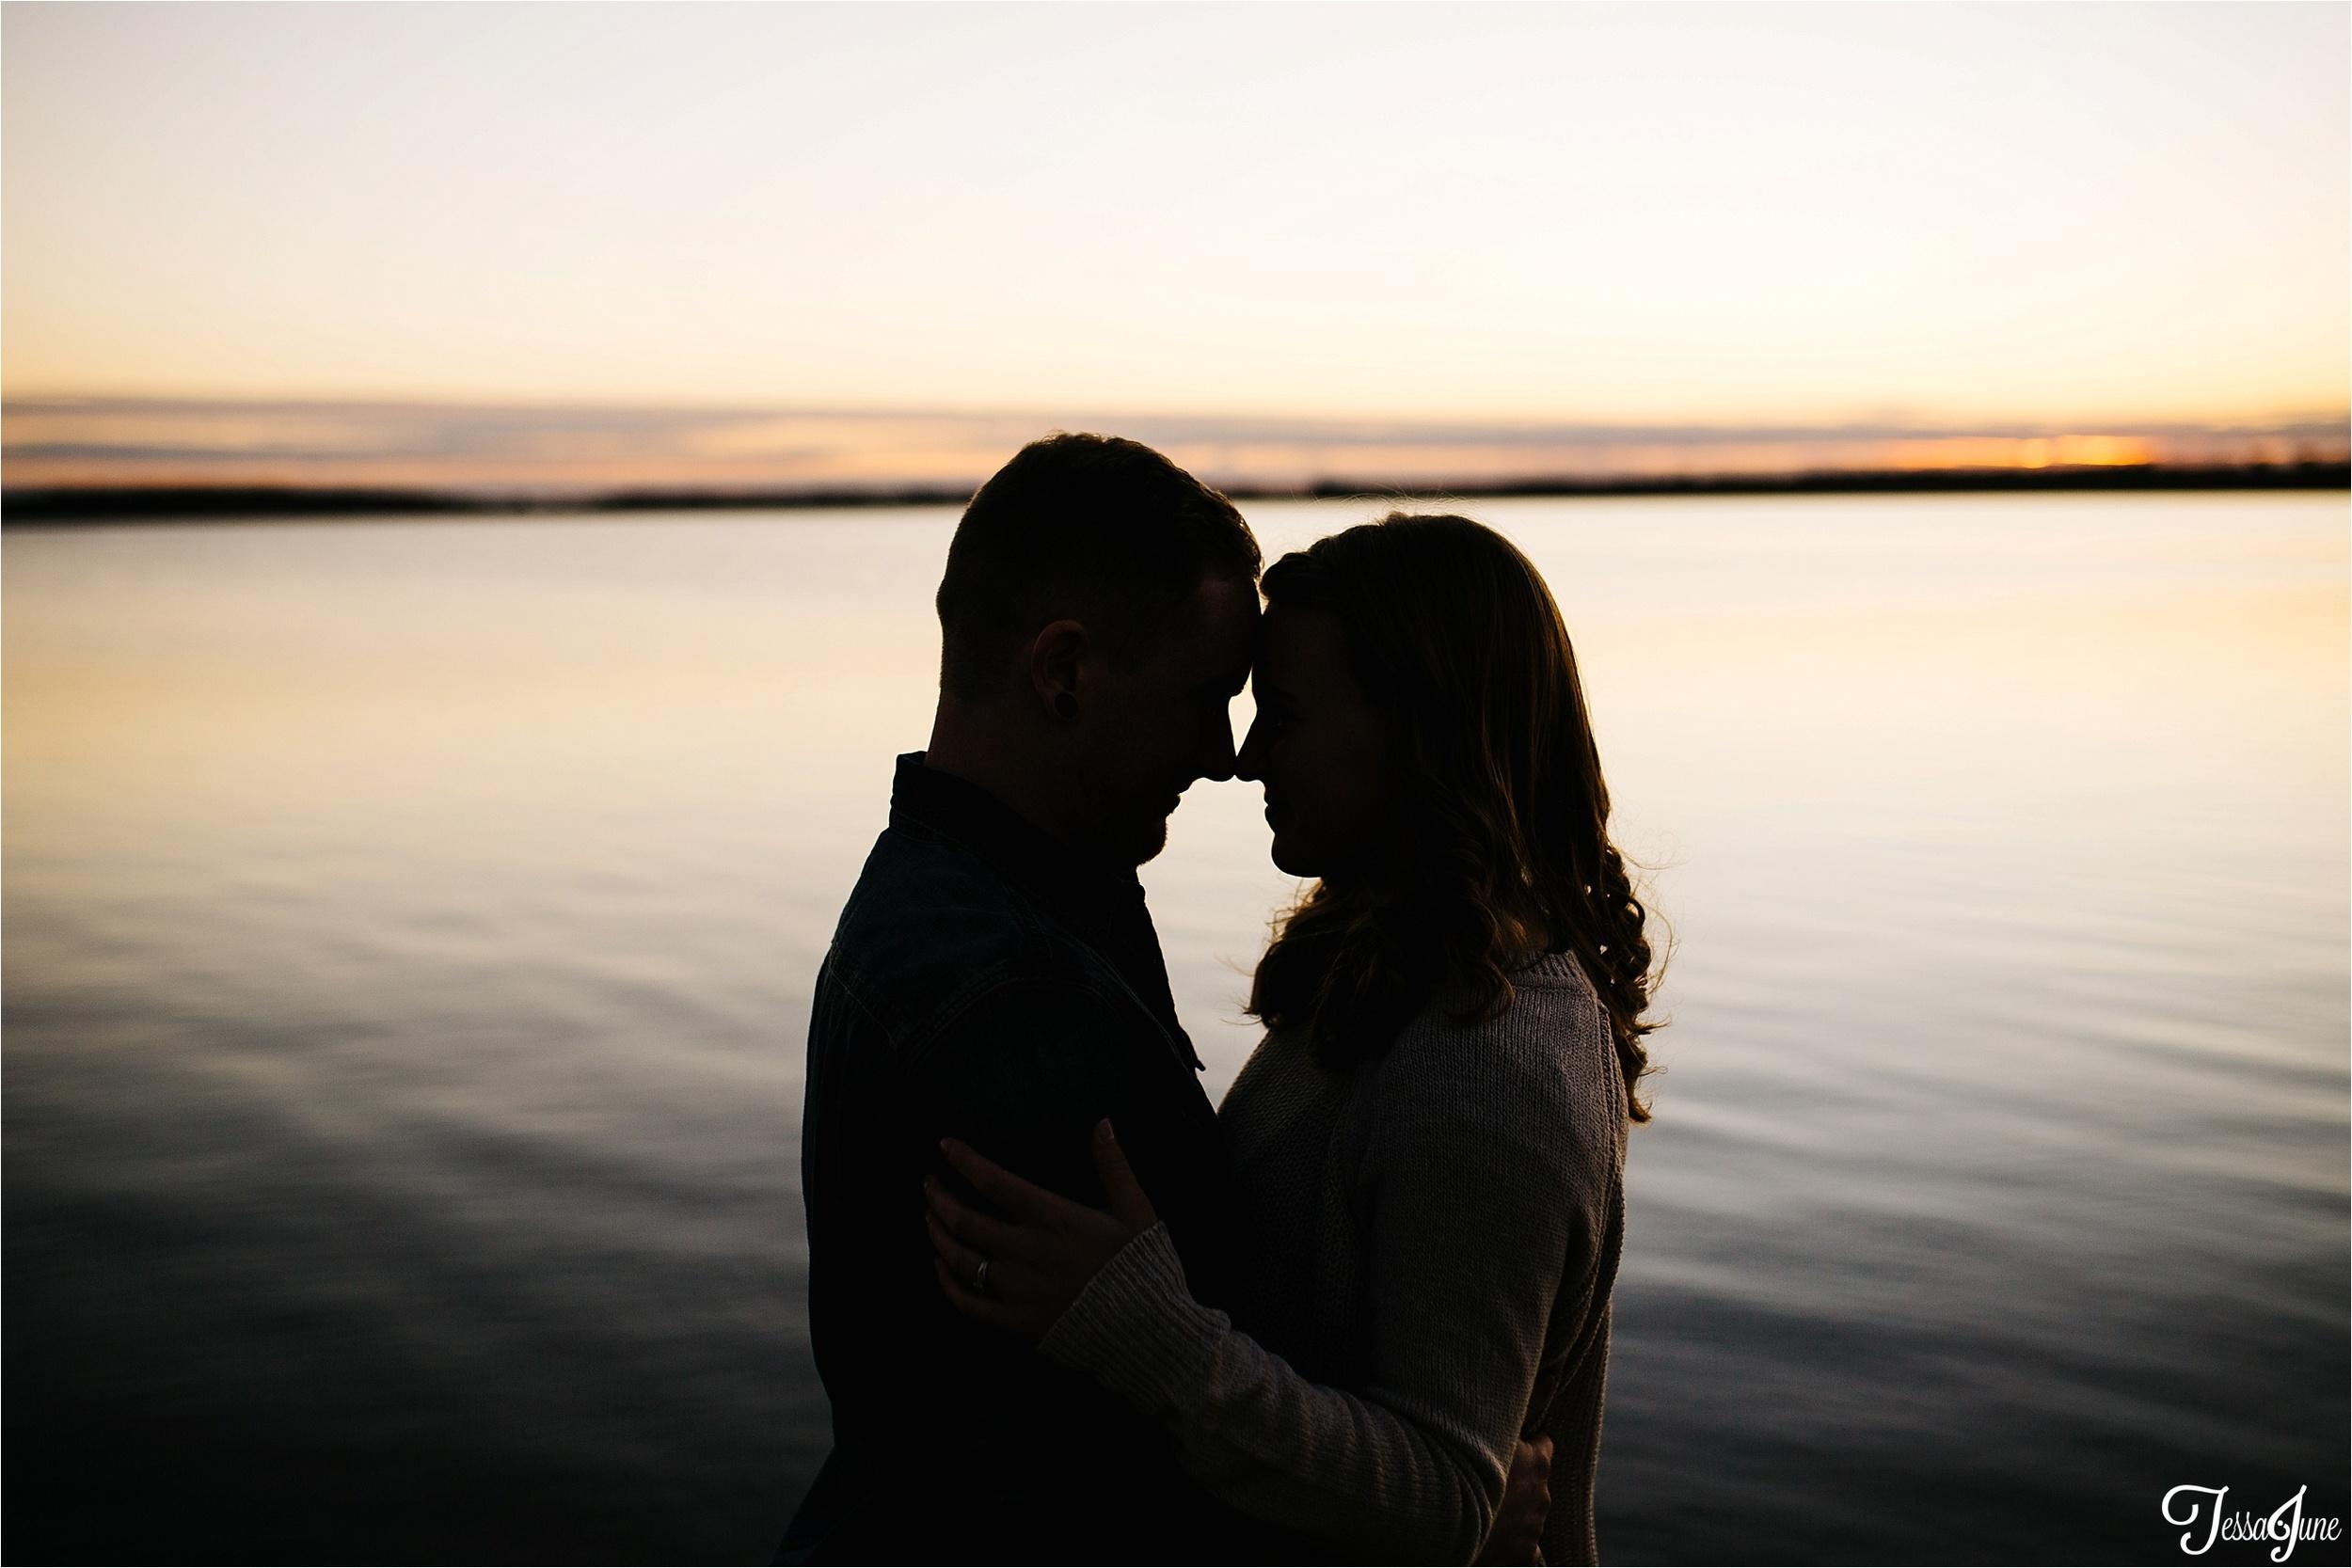 st-cloud-minnesota-photographer-engaged-wedding-lake-coffee-urban-vsco